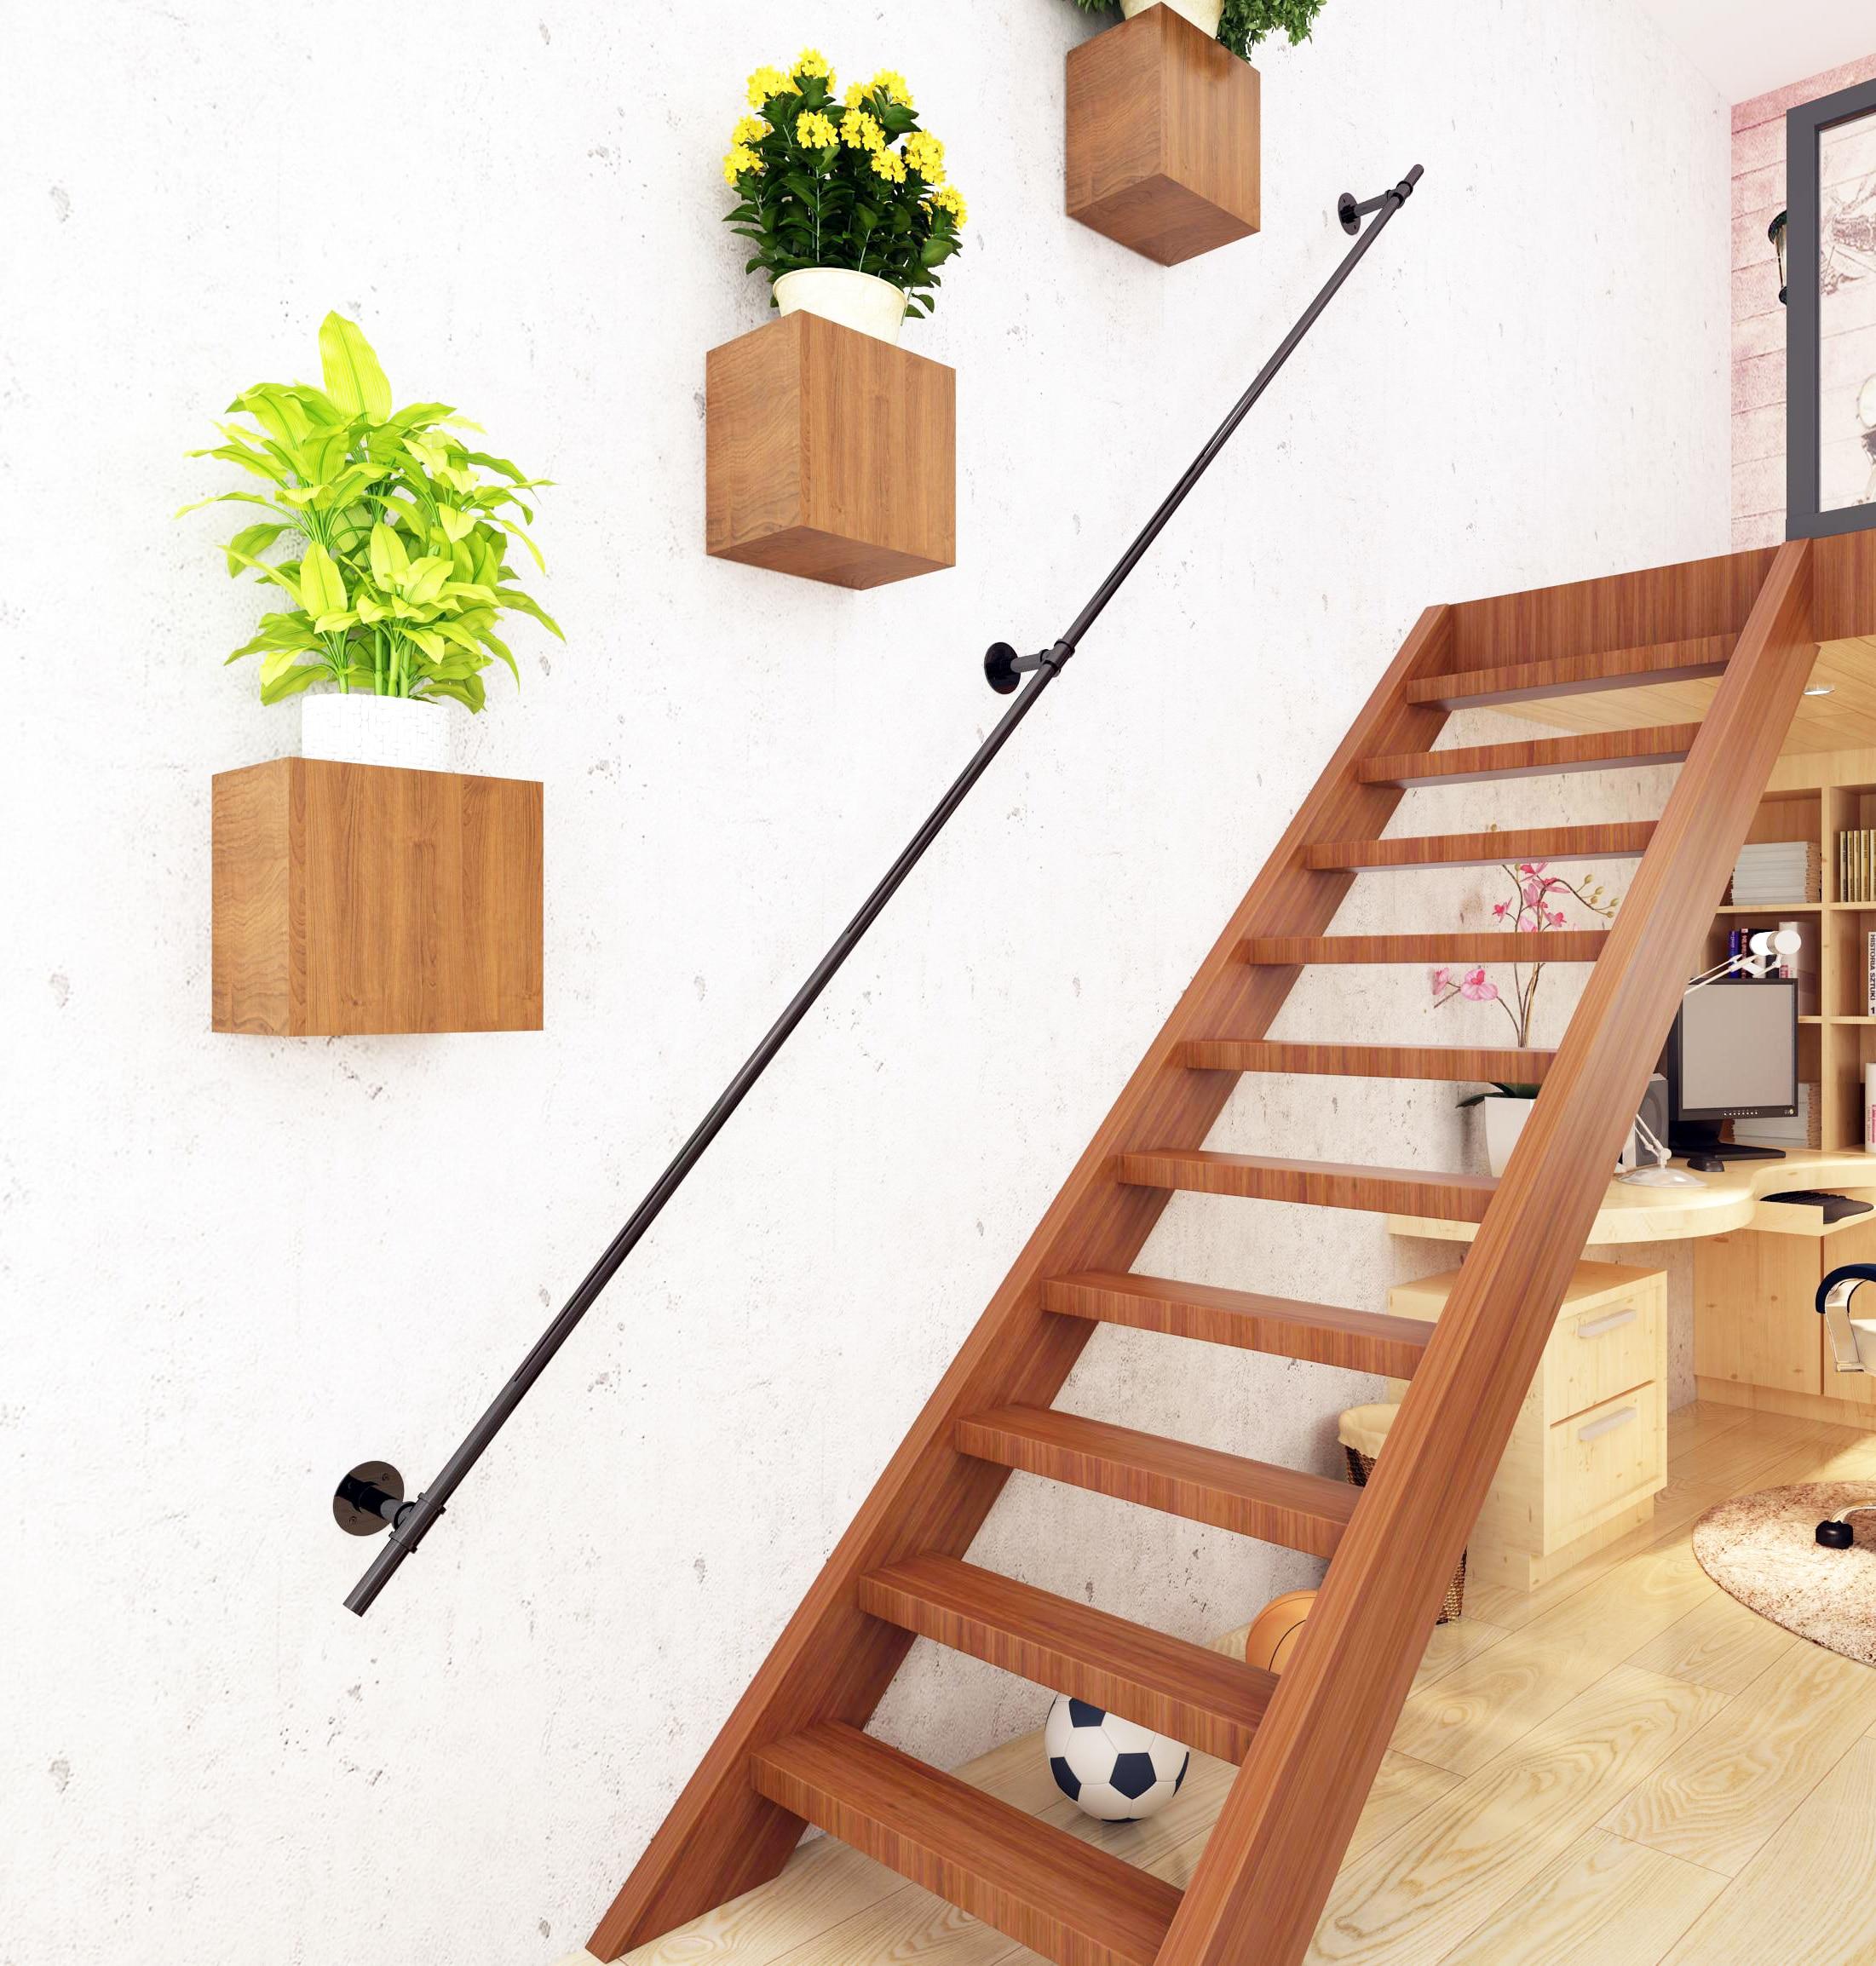 Diyhd Industrial Black Iron Loft Pipe Handrail For Stairs Rustic   Rustic Handrails For Stairs   Basement   Wooden   Banister   Metal   Deck